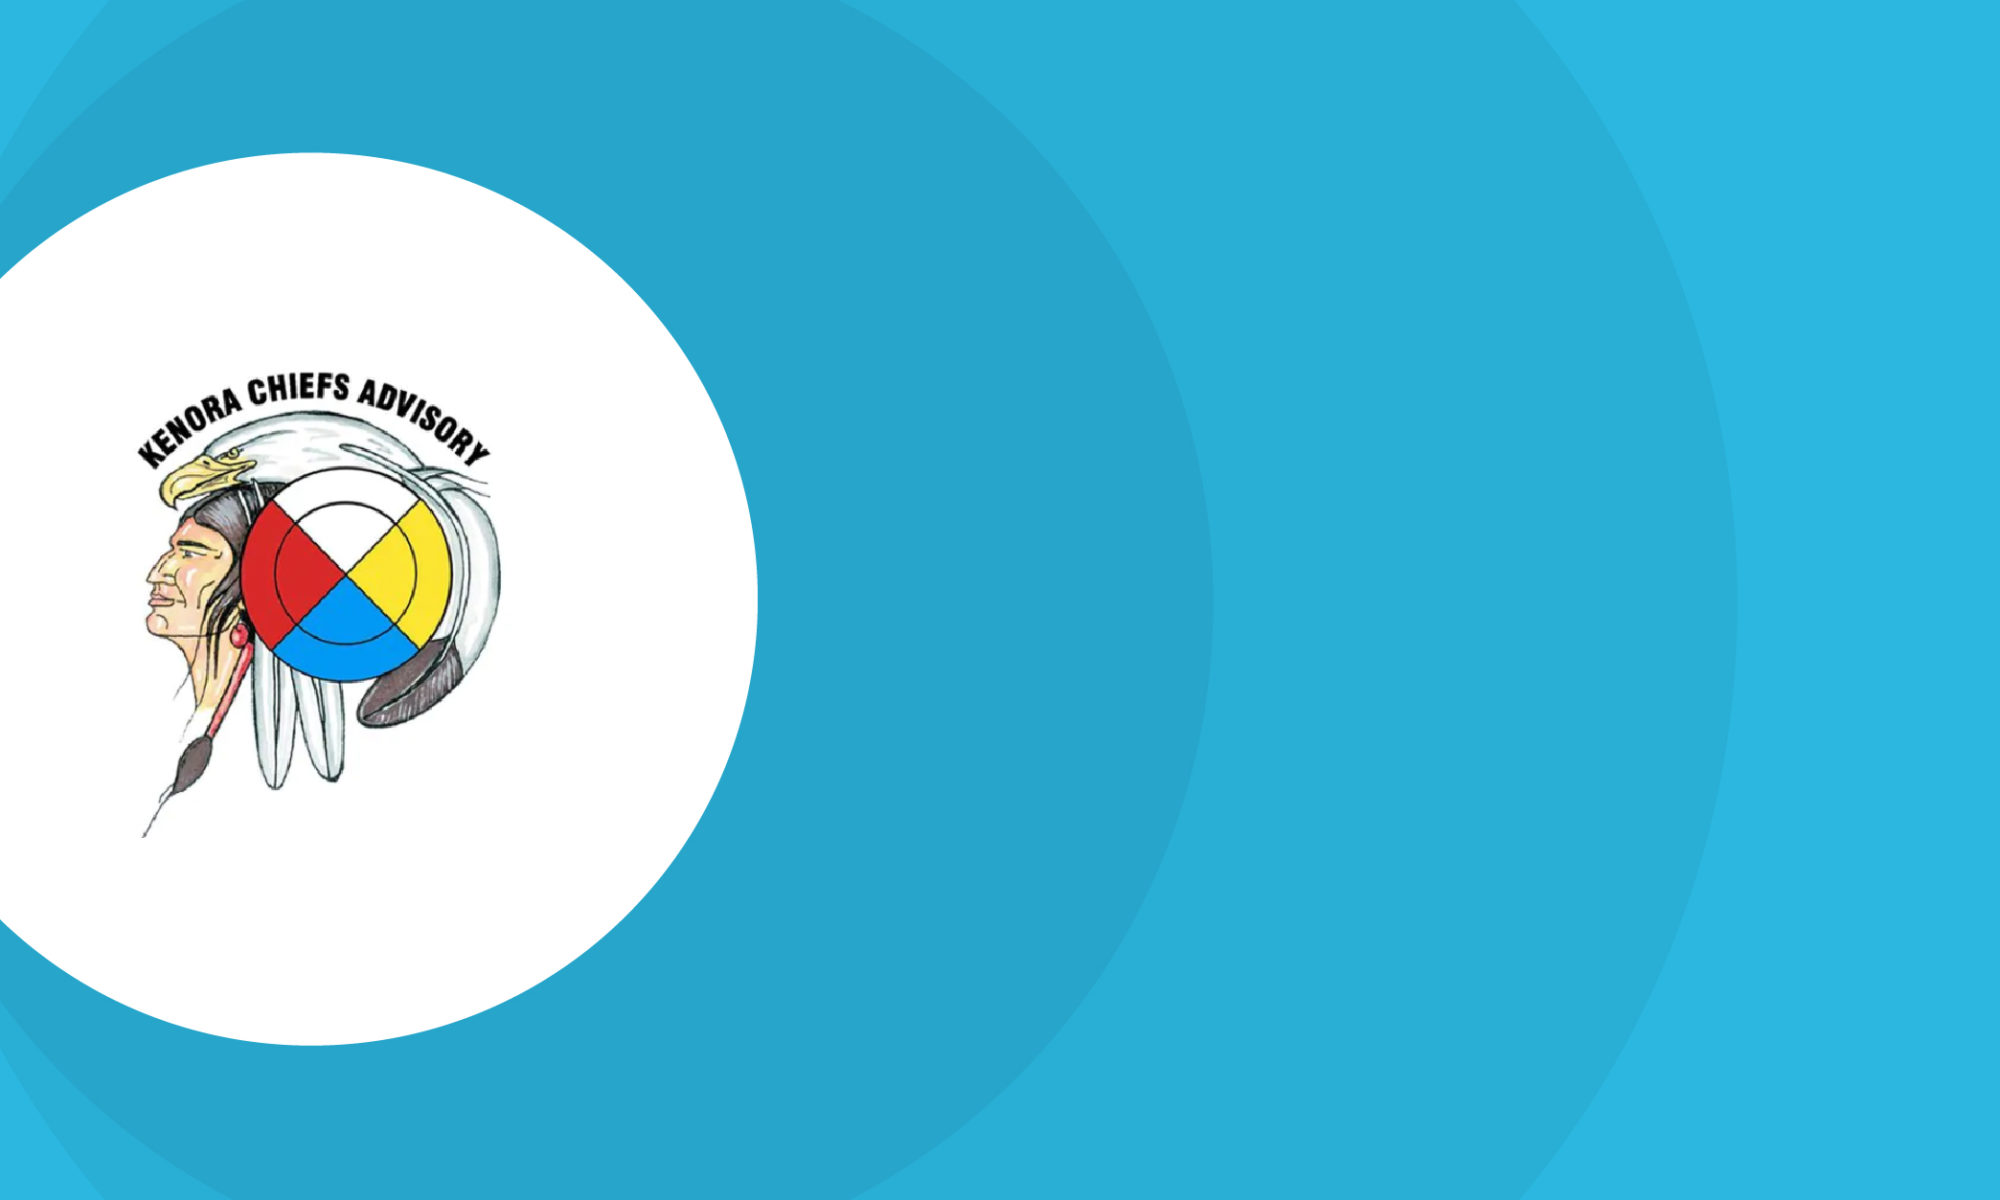 Decorative image including Kenora Chiefs Advisory logo